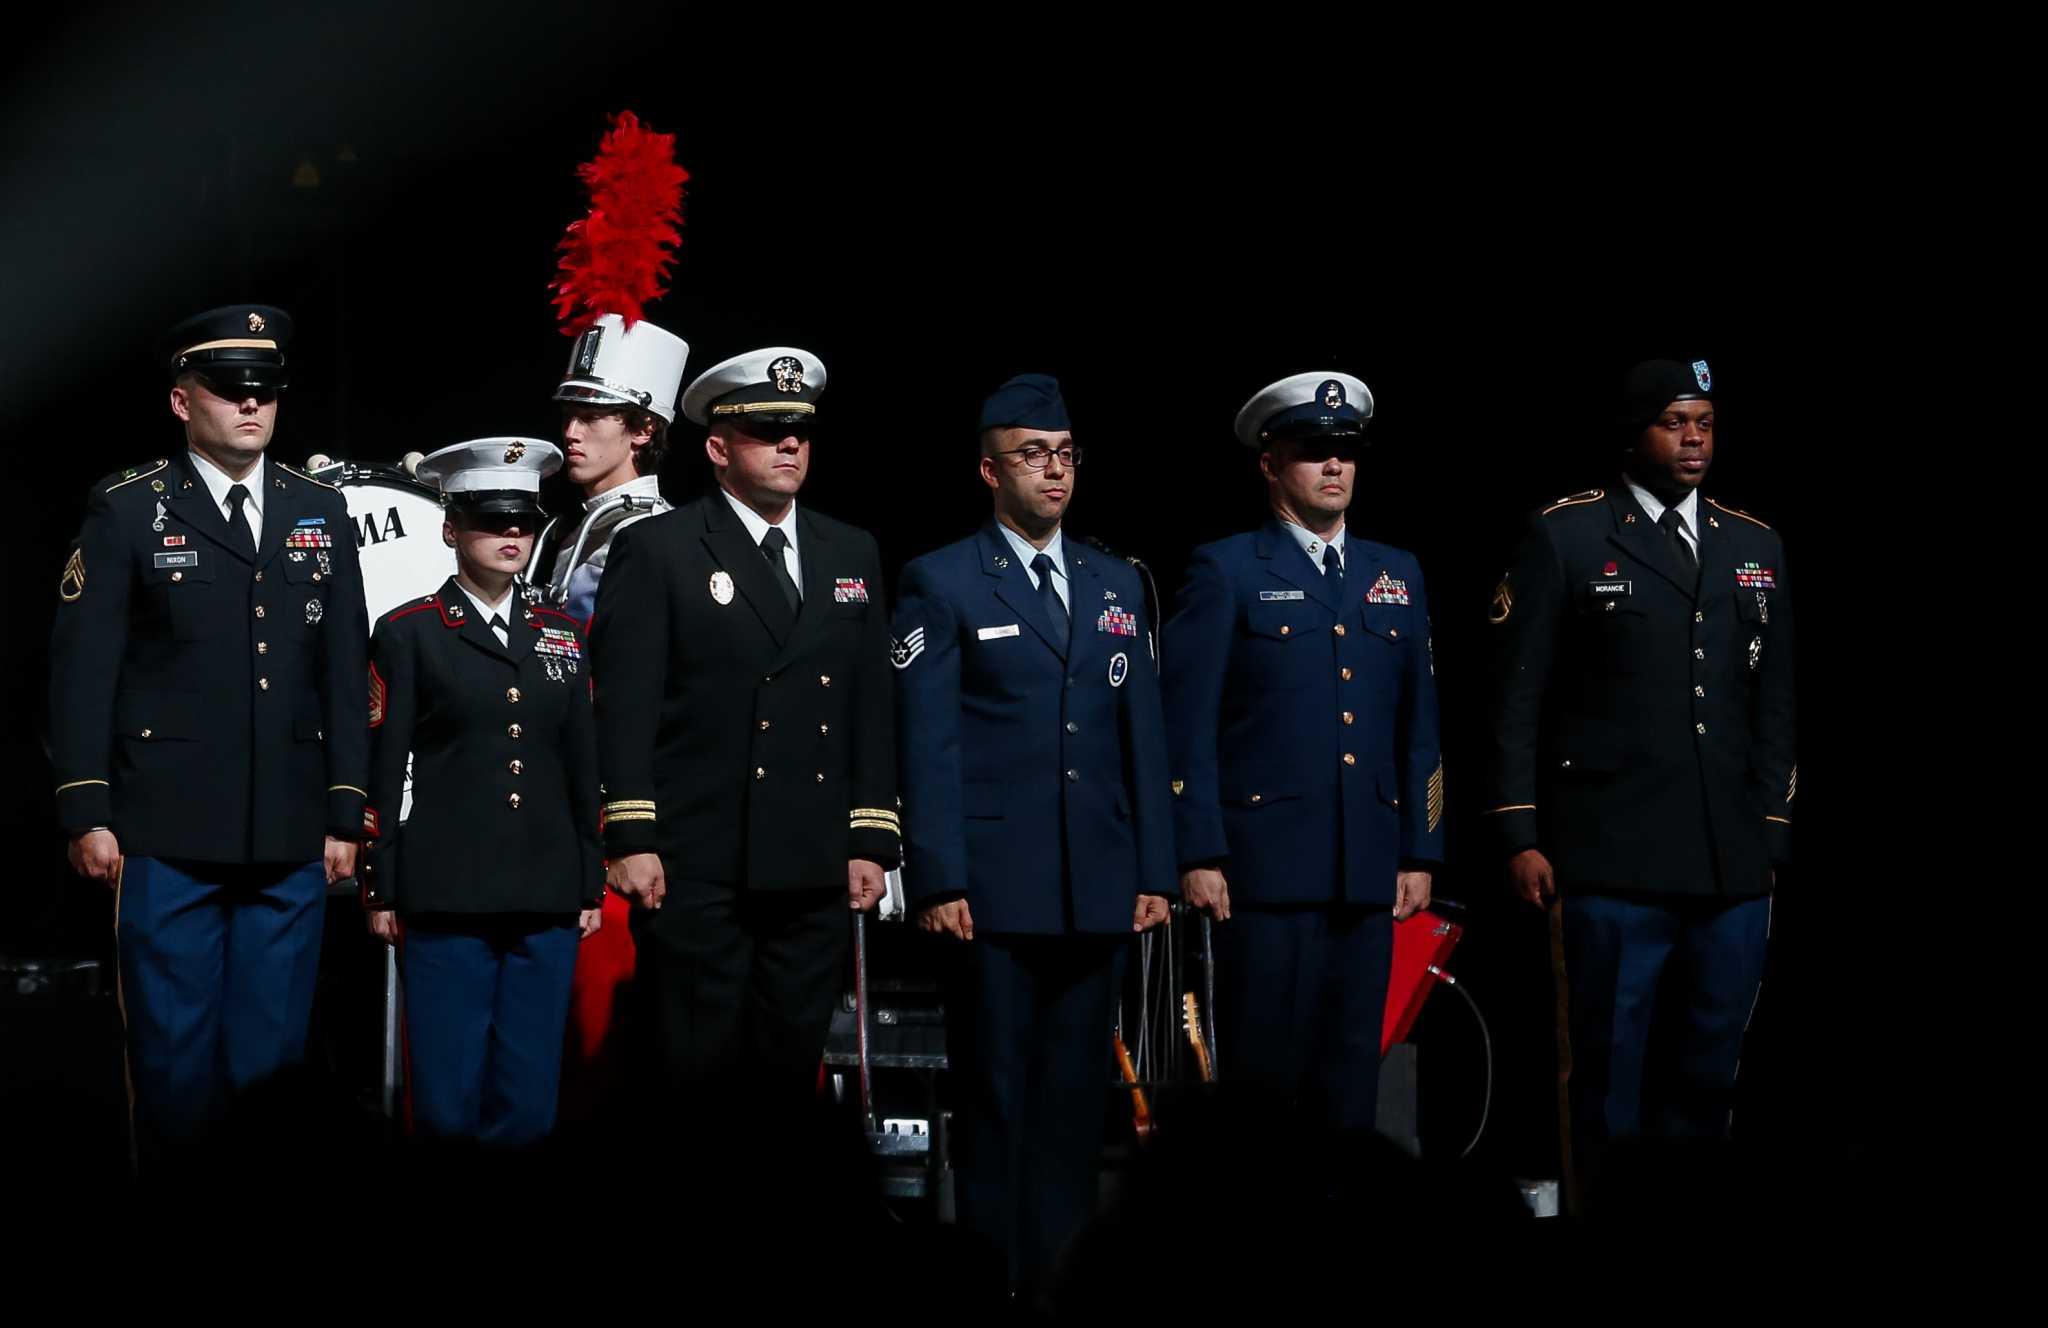 Eagles legend Joe Walsh honors veterans at all-star VetsAid Concert in Houston